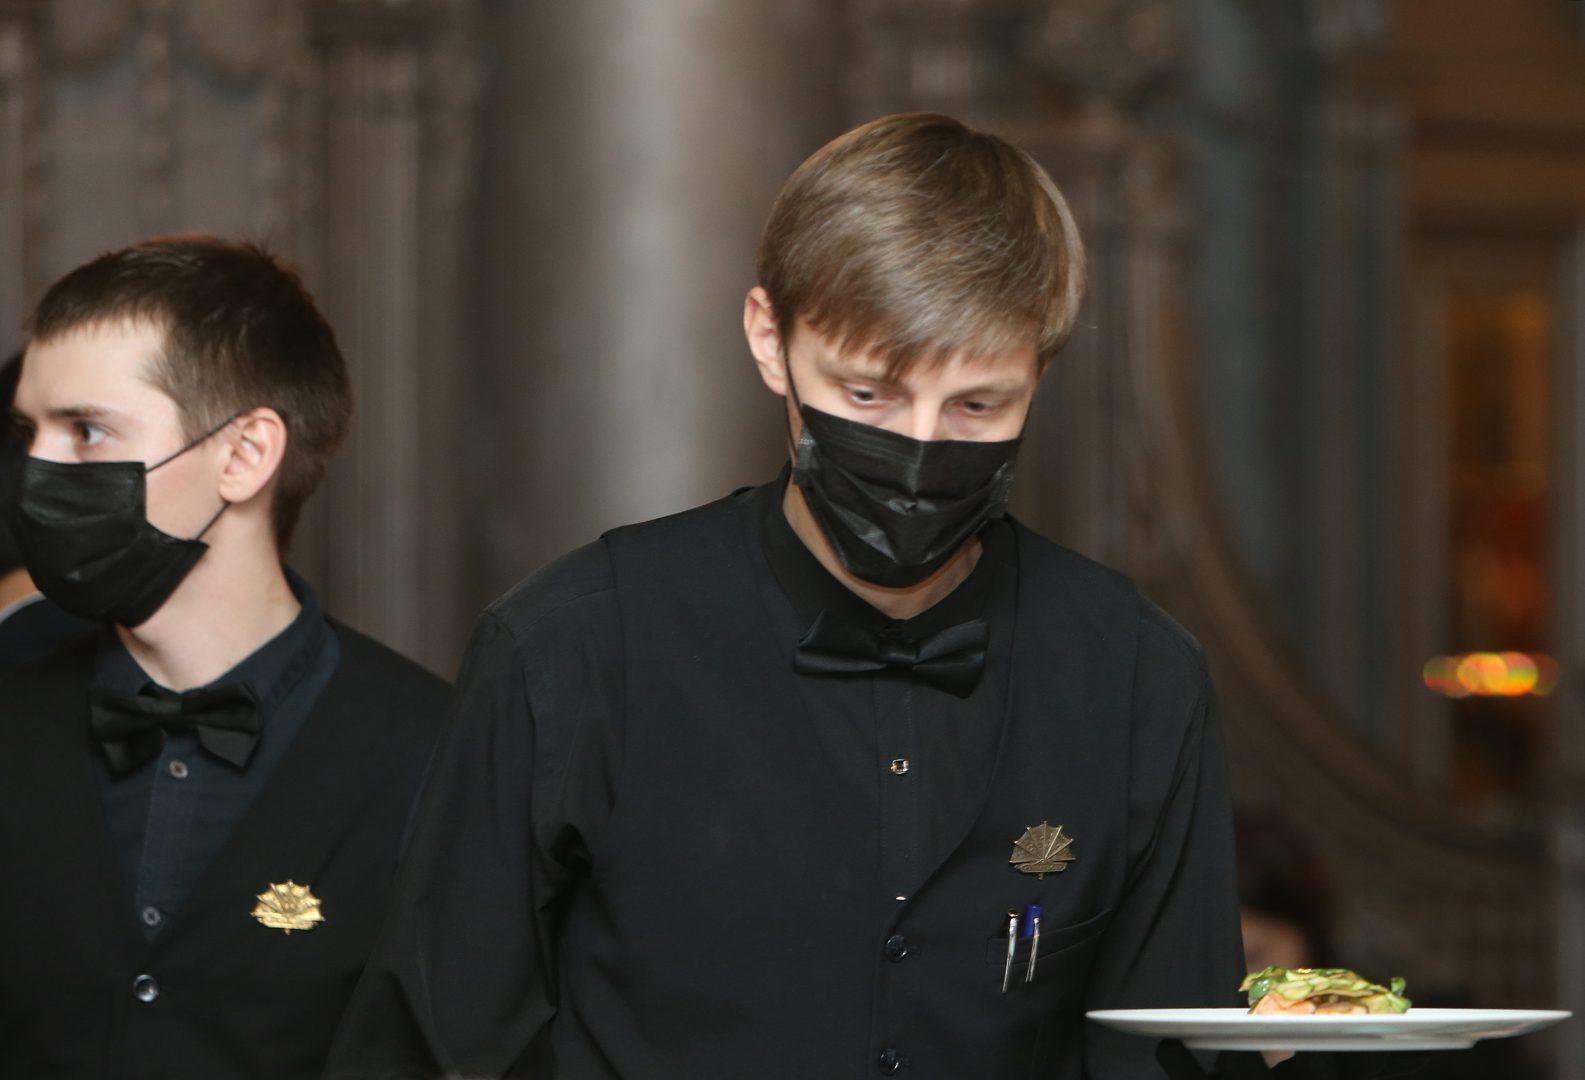 Ресторану Balagan грозит штраф до 1 миллиона рублей за нарушения мер профилактики коронавируса. Фото: Наталия Нечаева, «Вечерняя Москва»